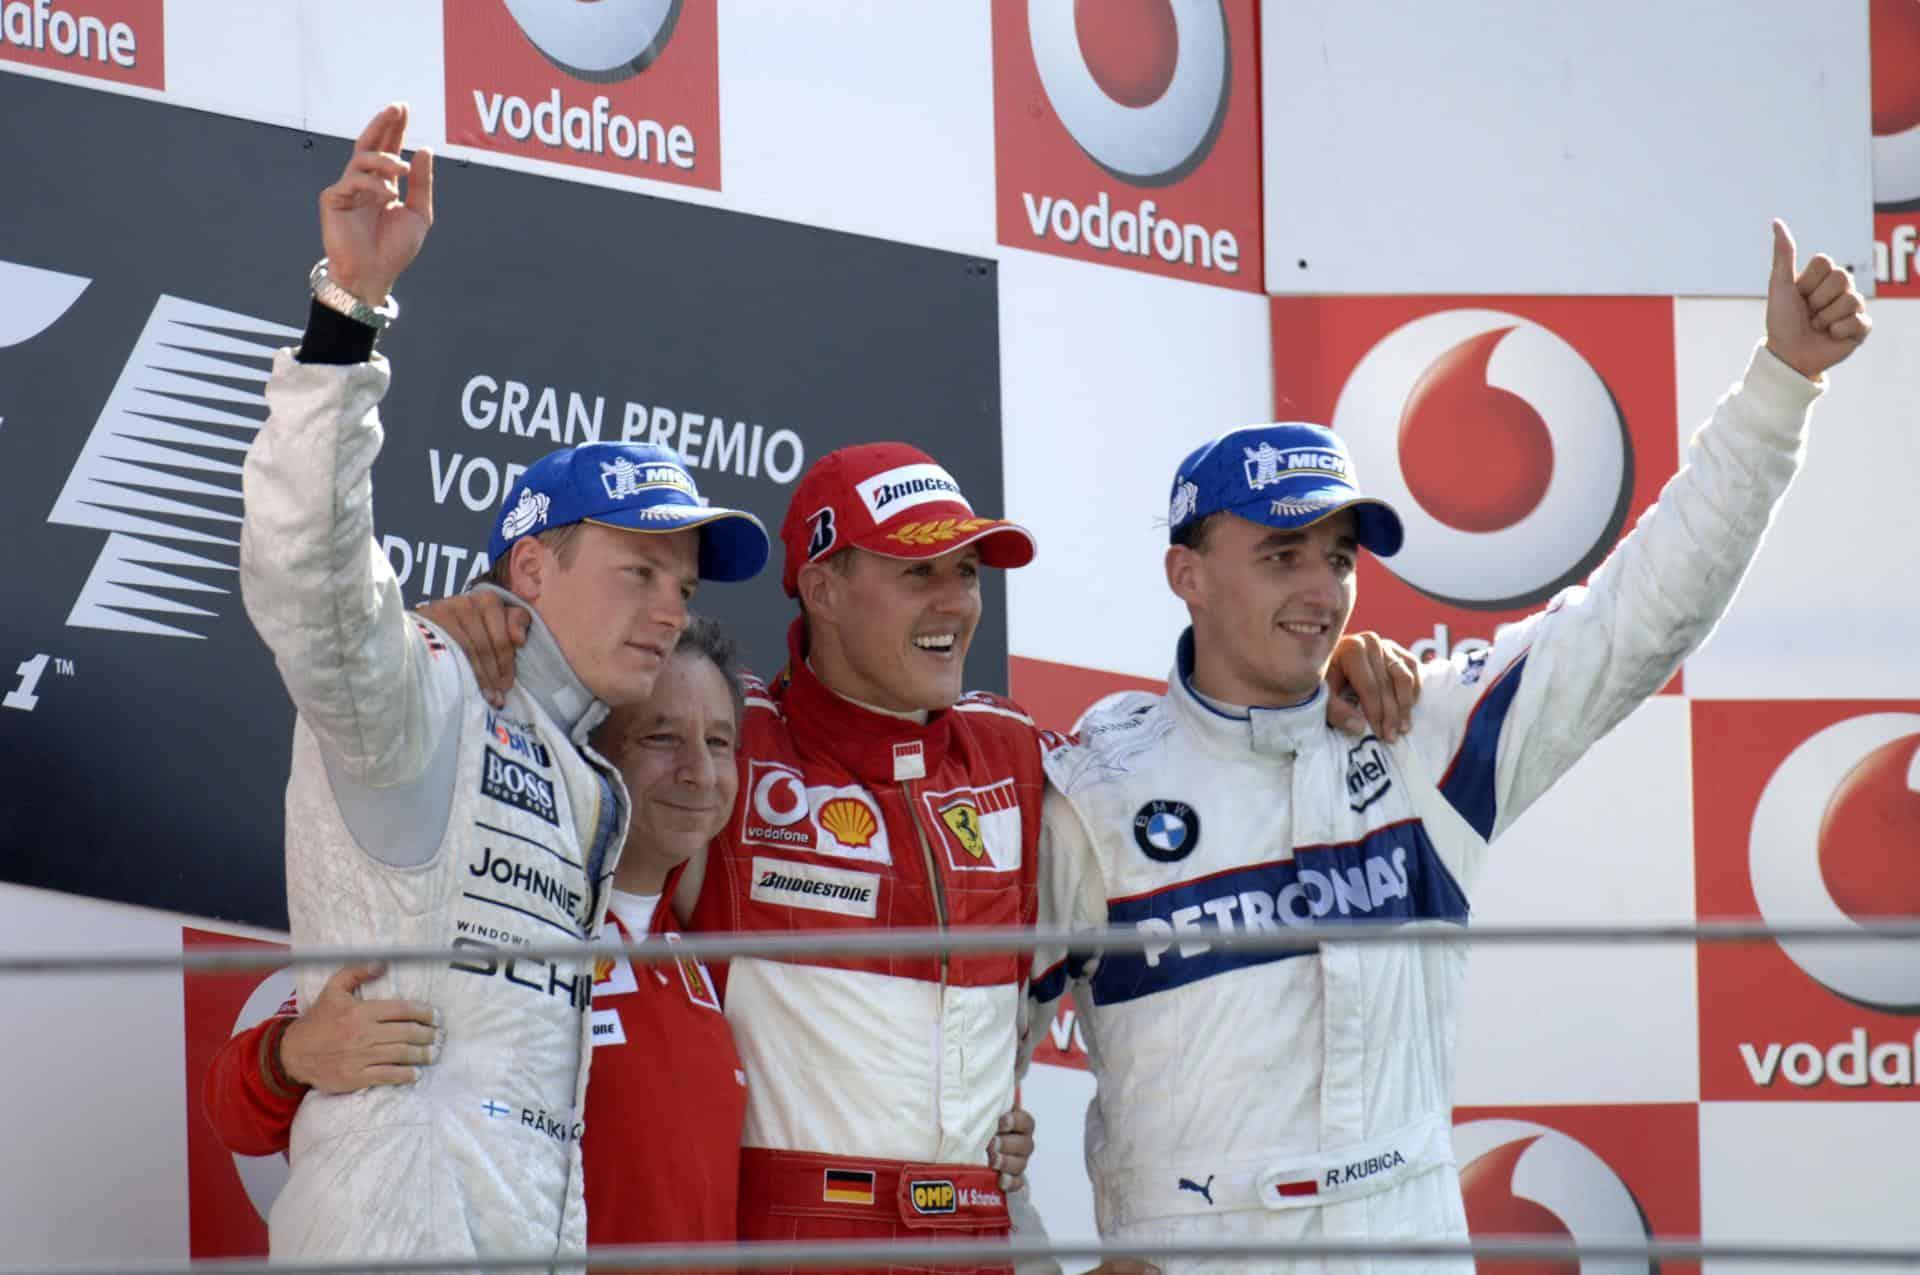 Italian-GP-F1-2006-Monza-podium-Photo-Fe